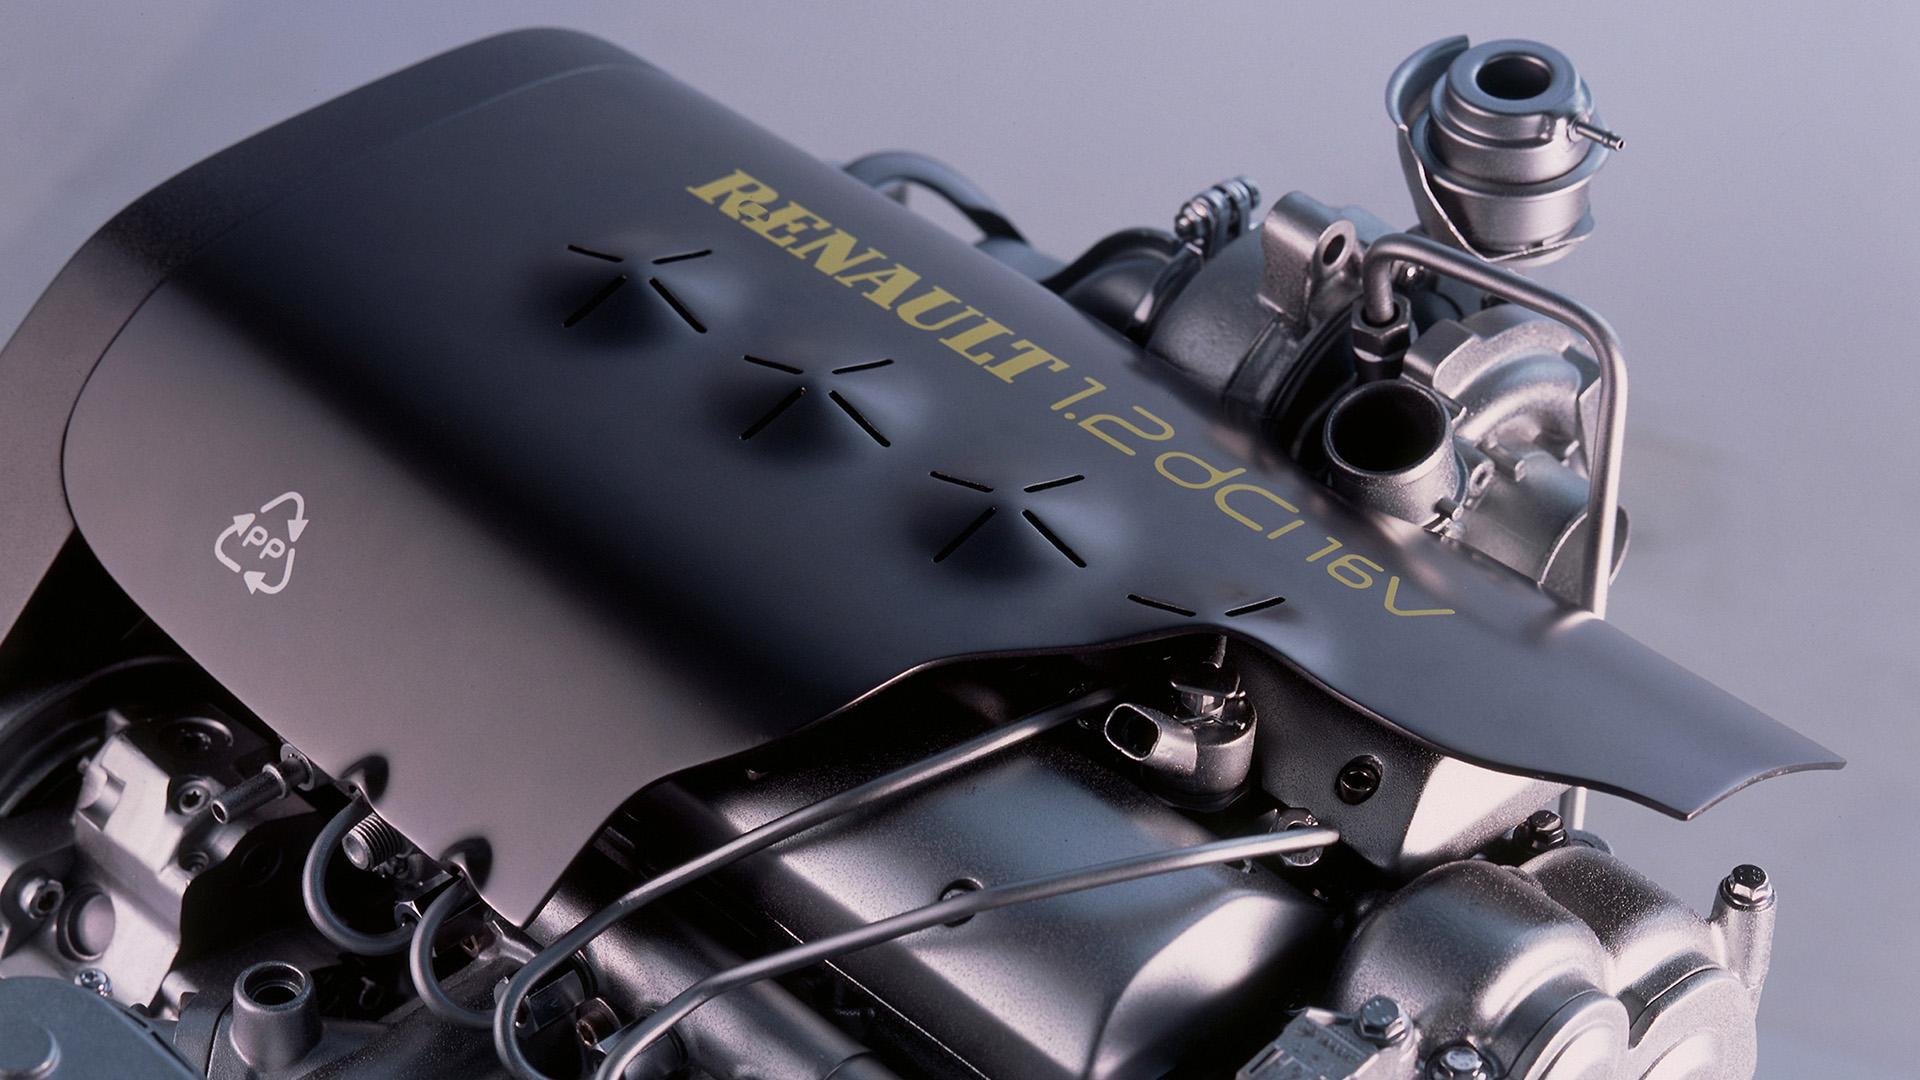 H Renault σταματά την εξέλιξη ντίζελ κινητήρων